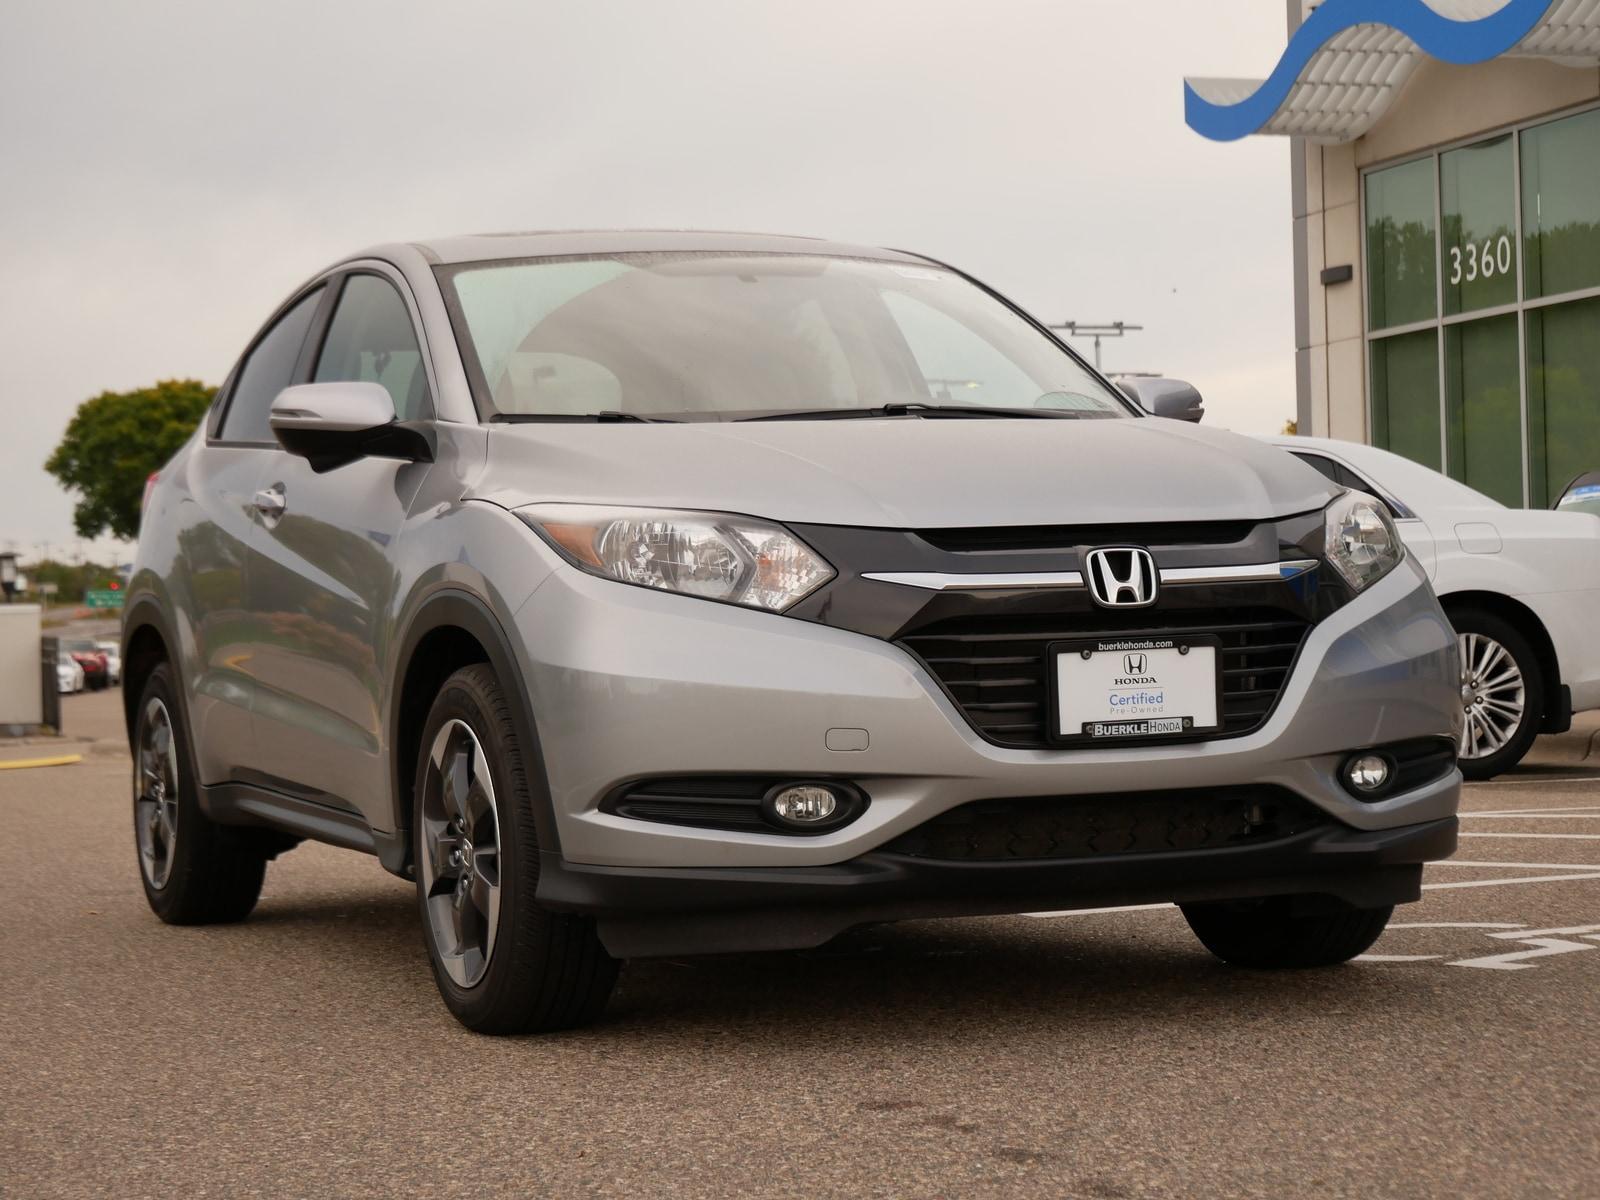 Certified 2018 Honda HR-V EX with VIN 3CZRU6H58JG729689 for sale in Saint Paul, Minnesota